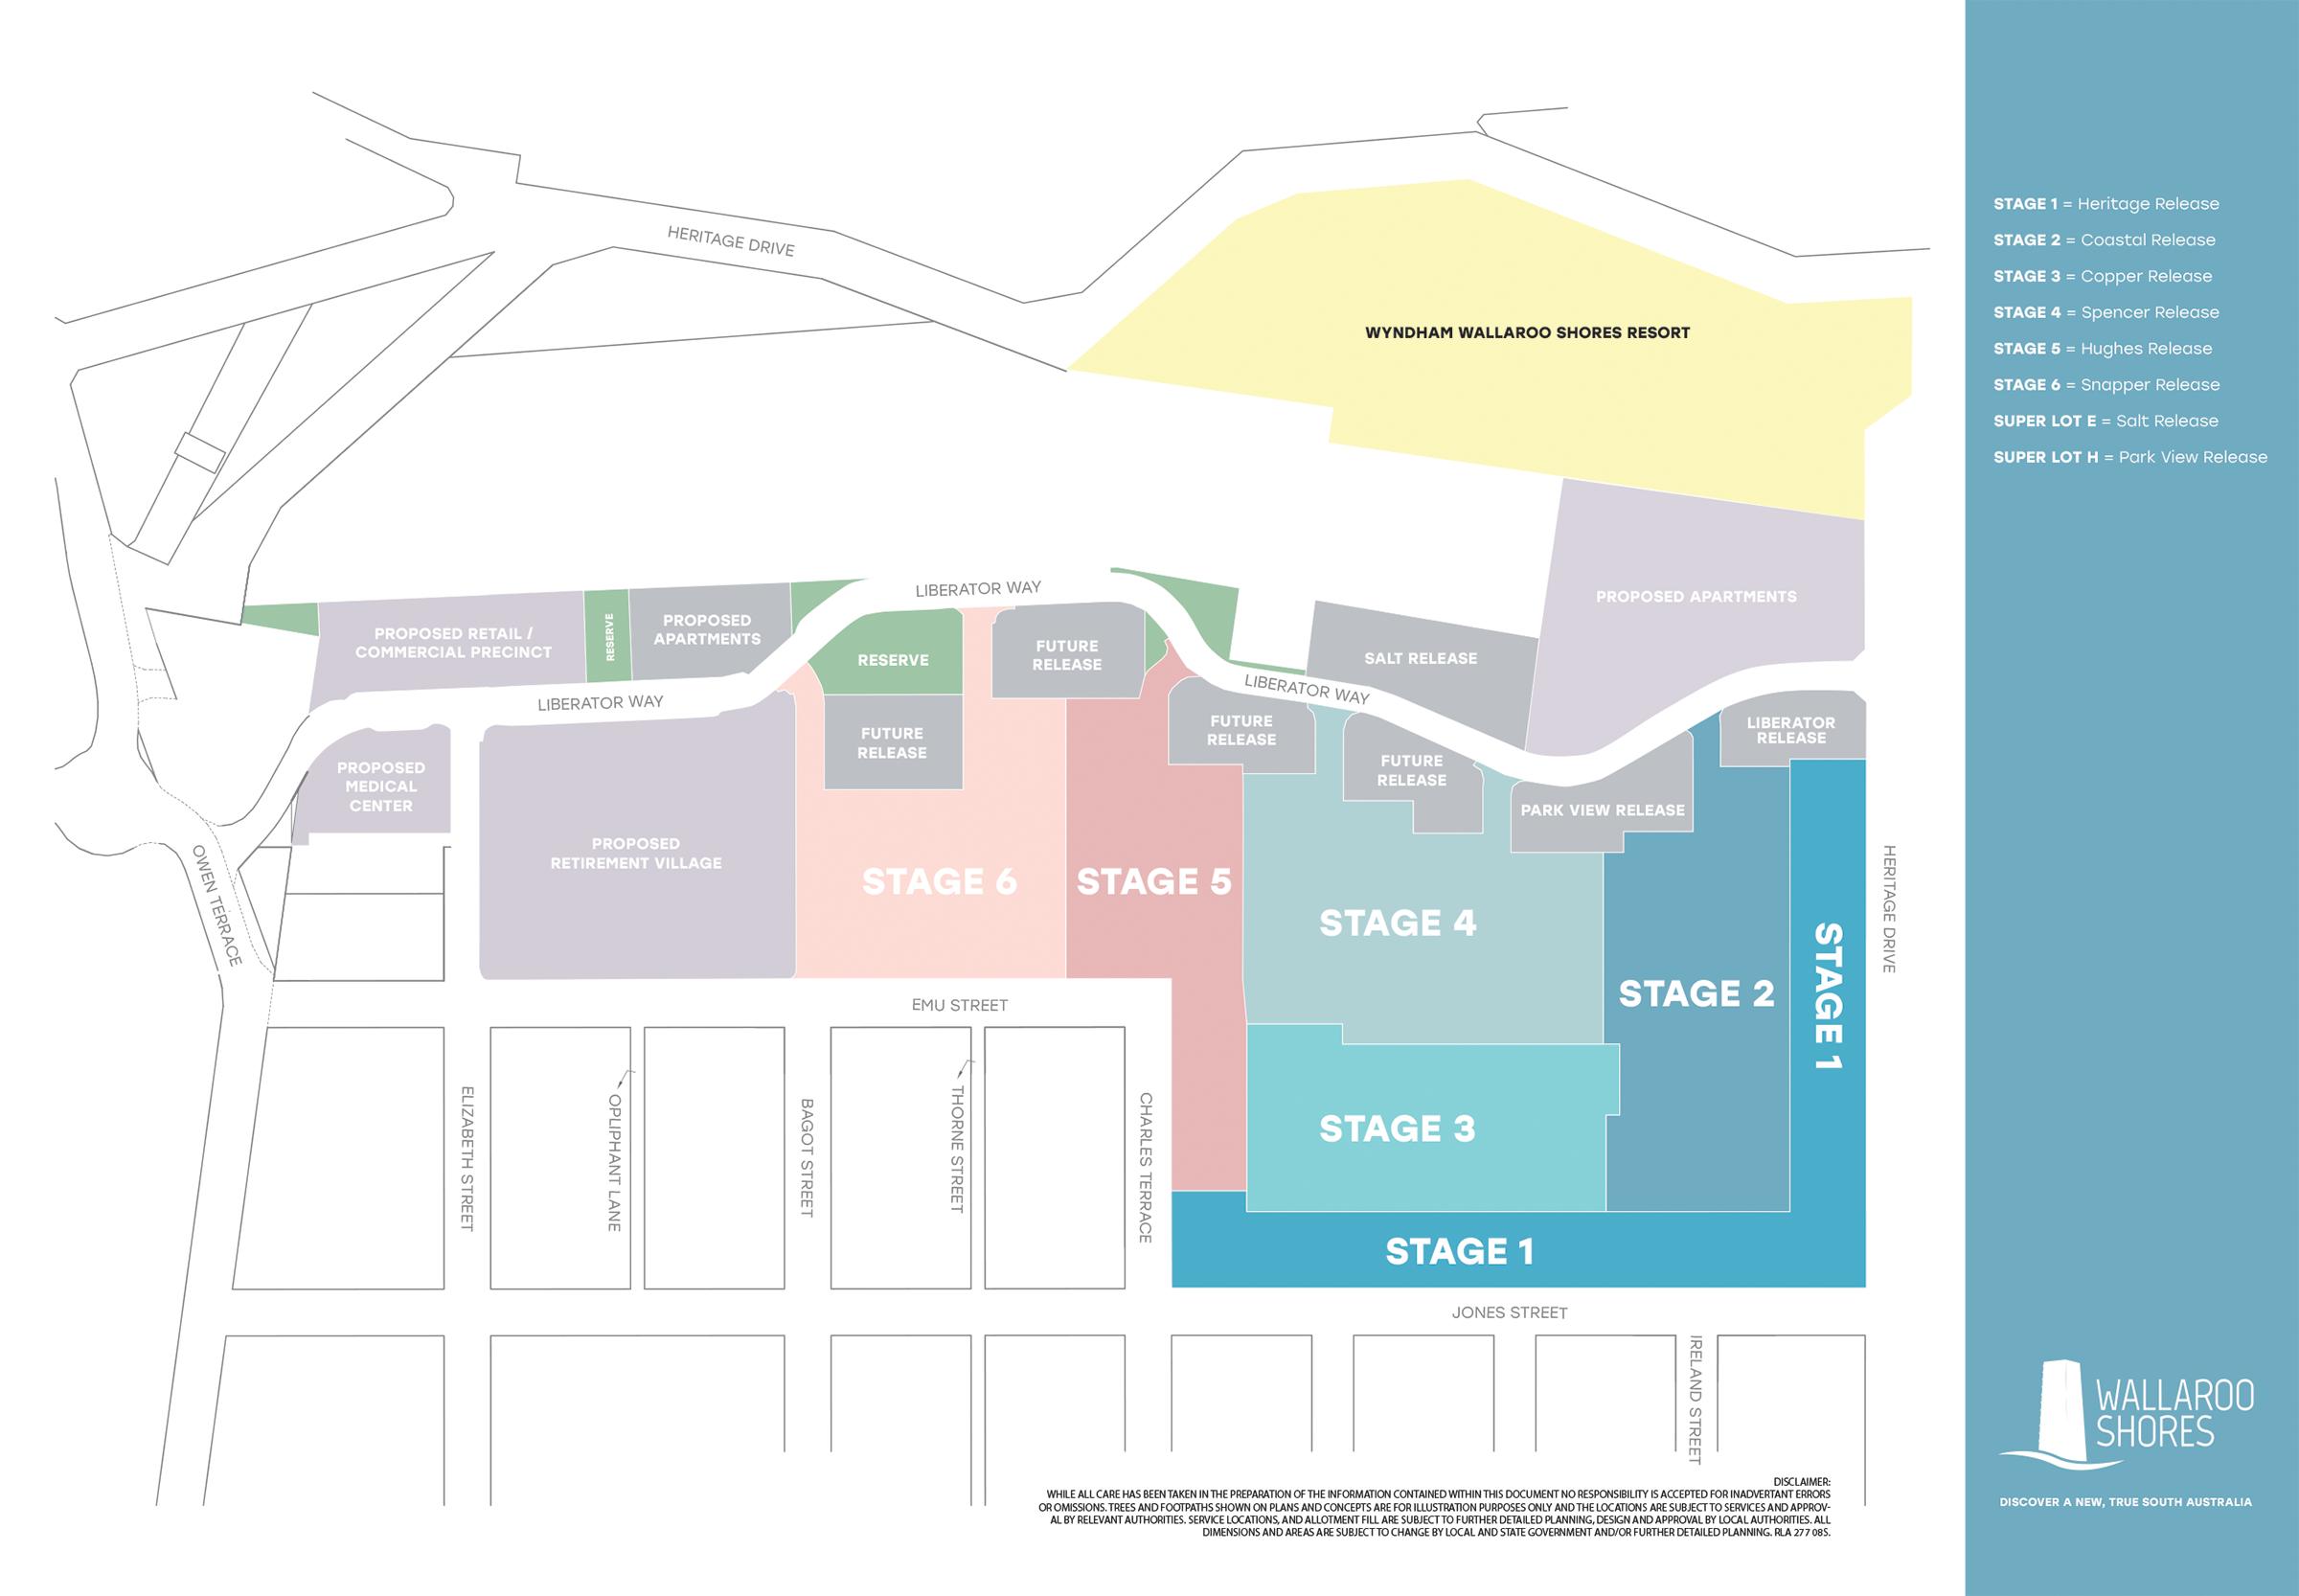 Wallaroo Shore Master Plan